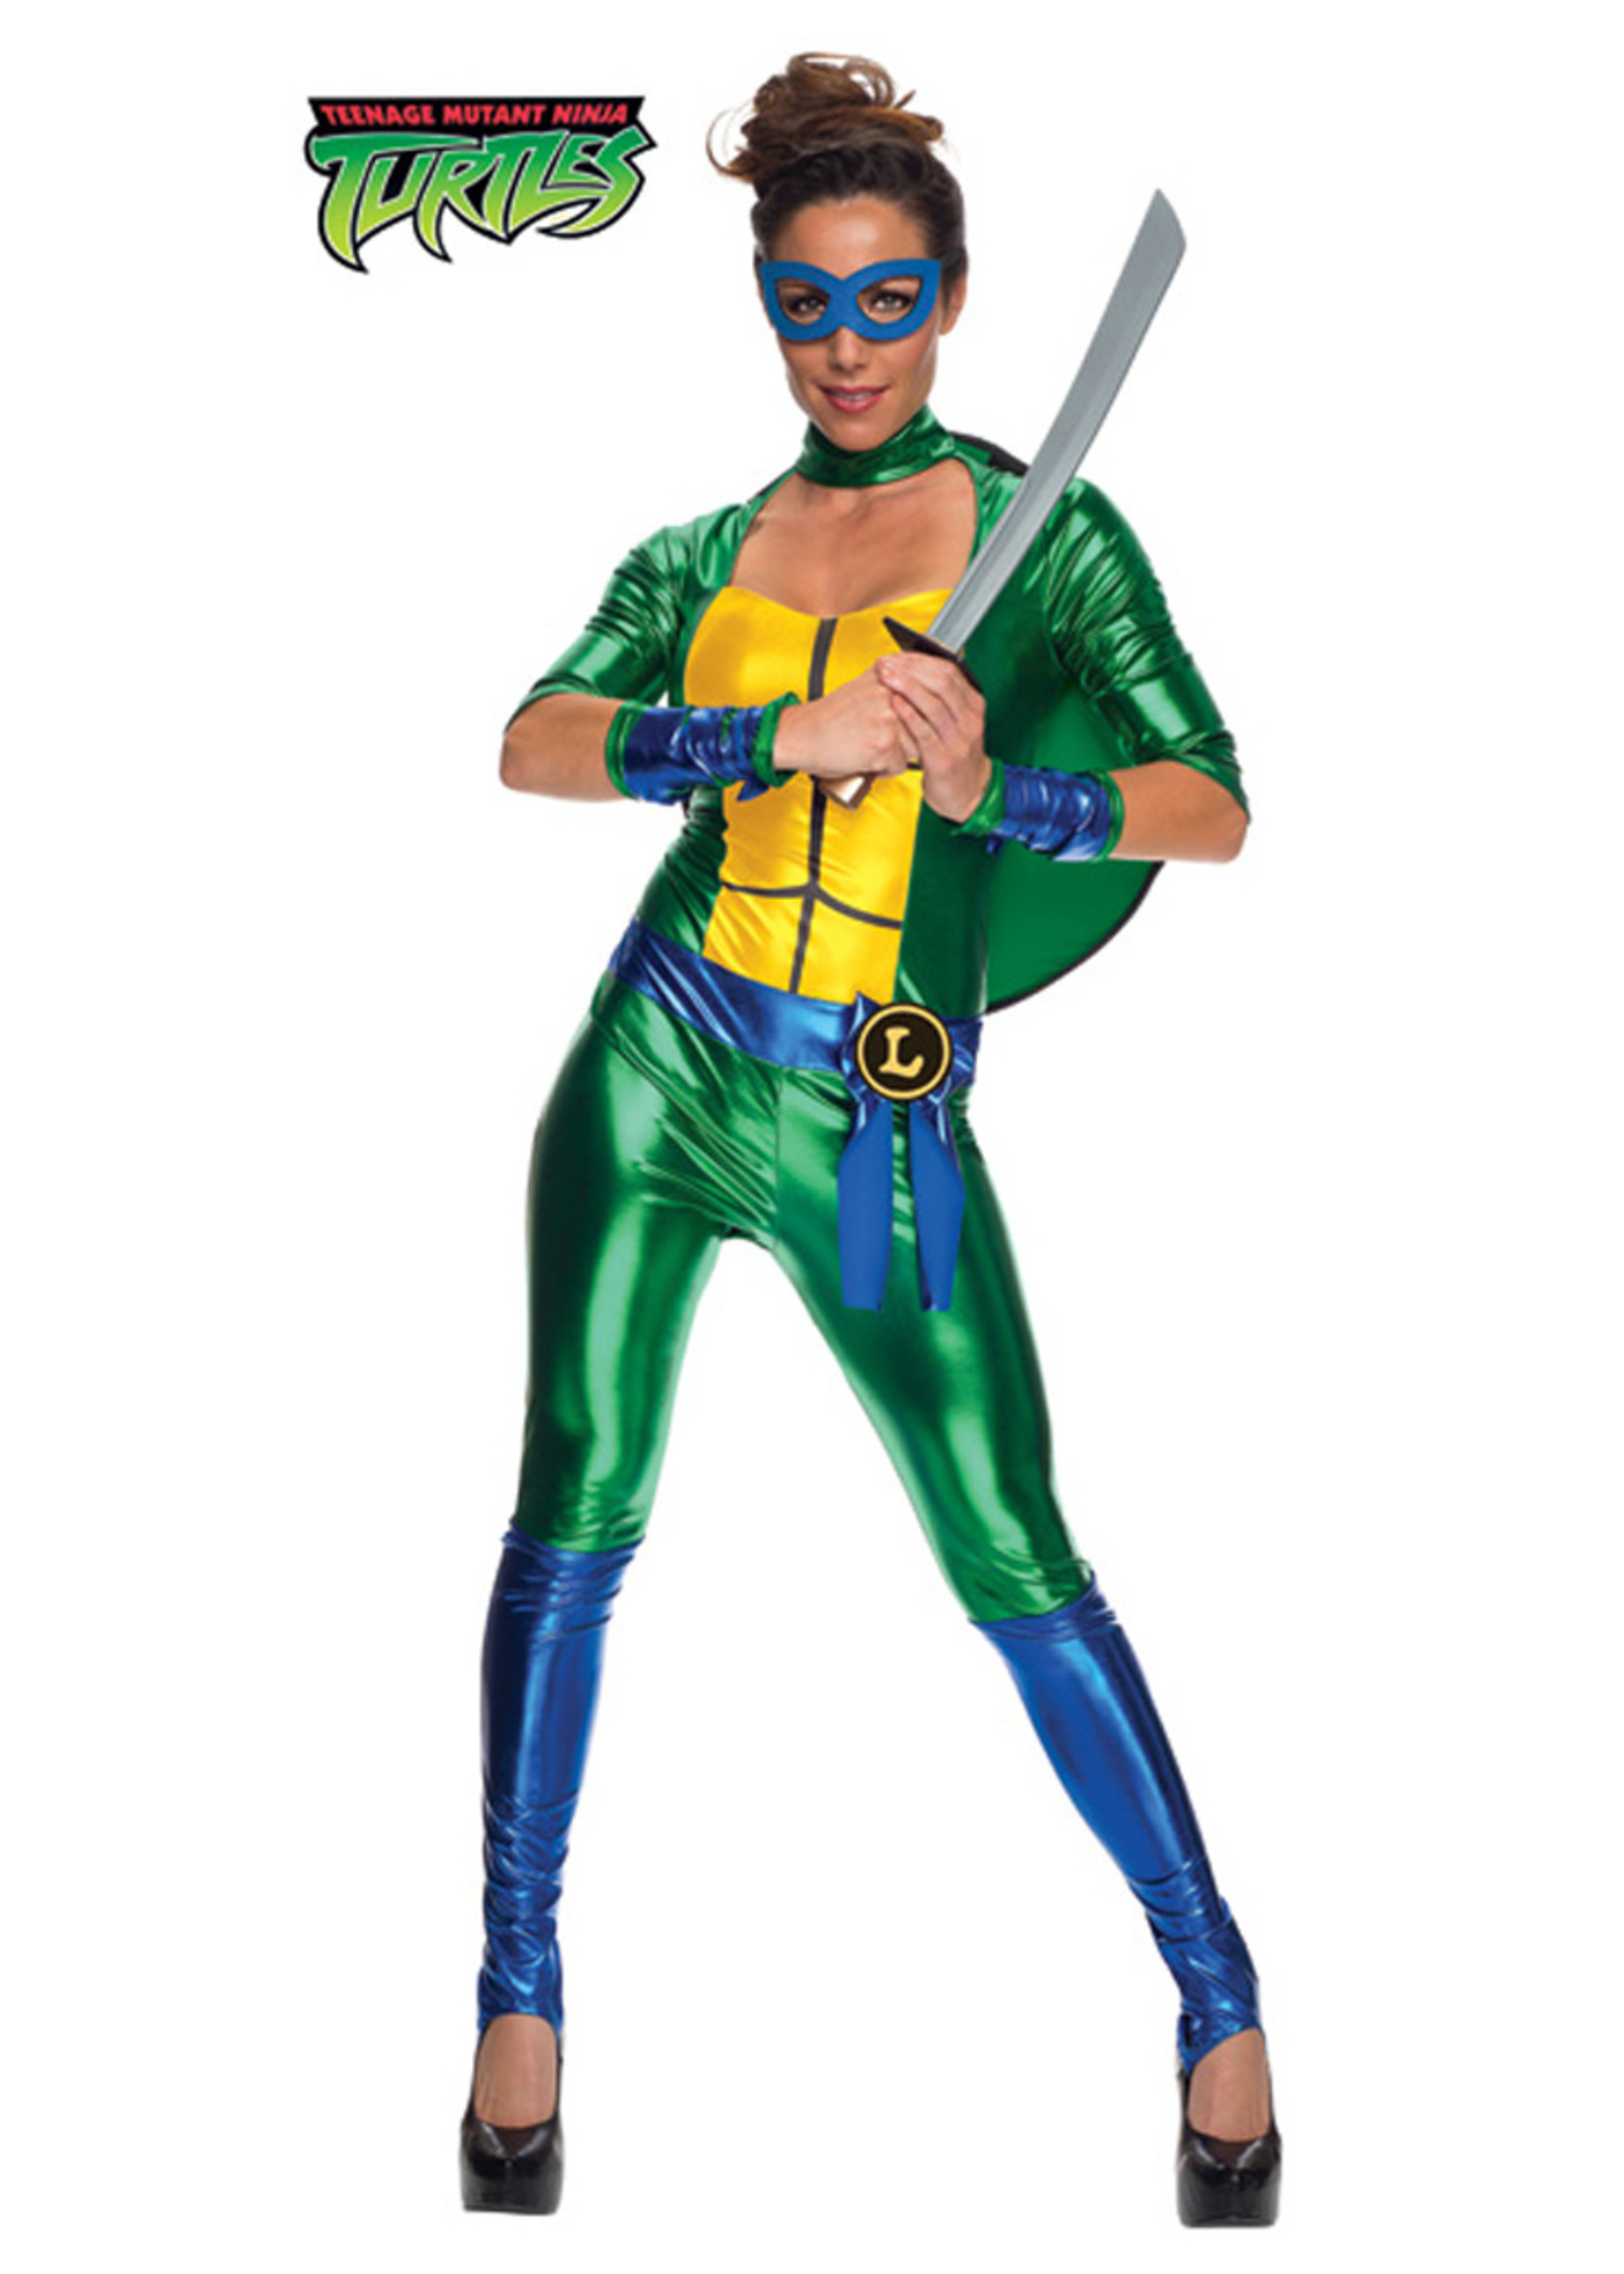 Leonardo TMNT Costume - Women's